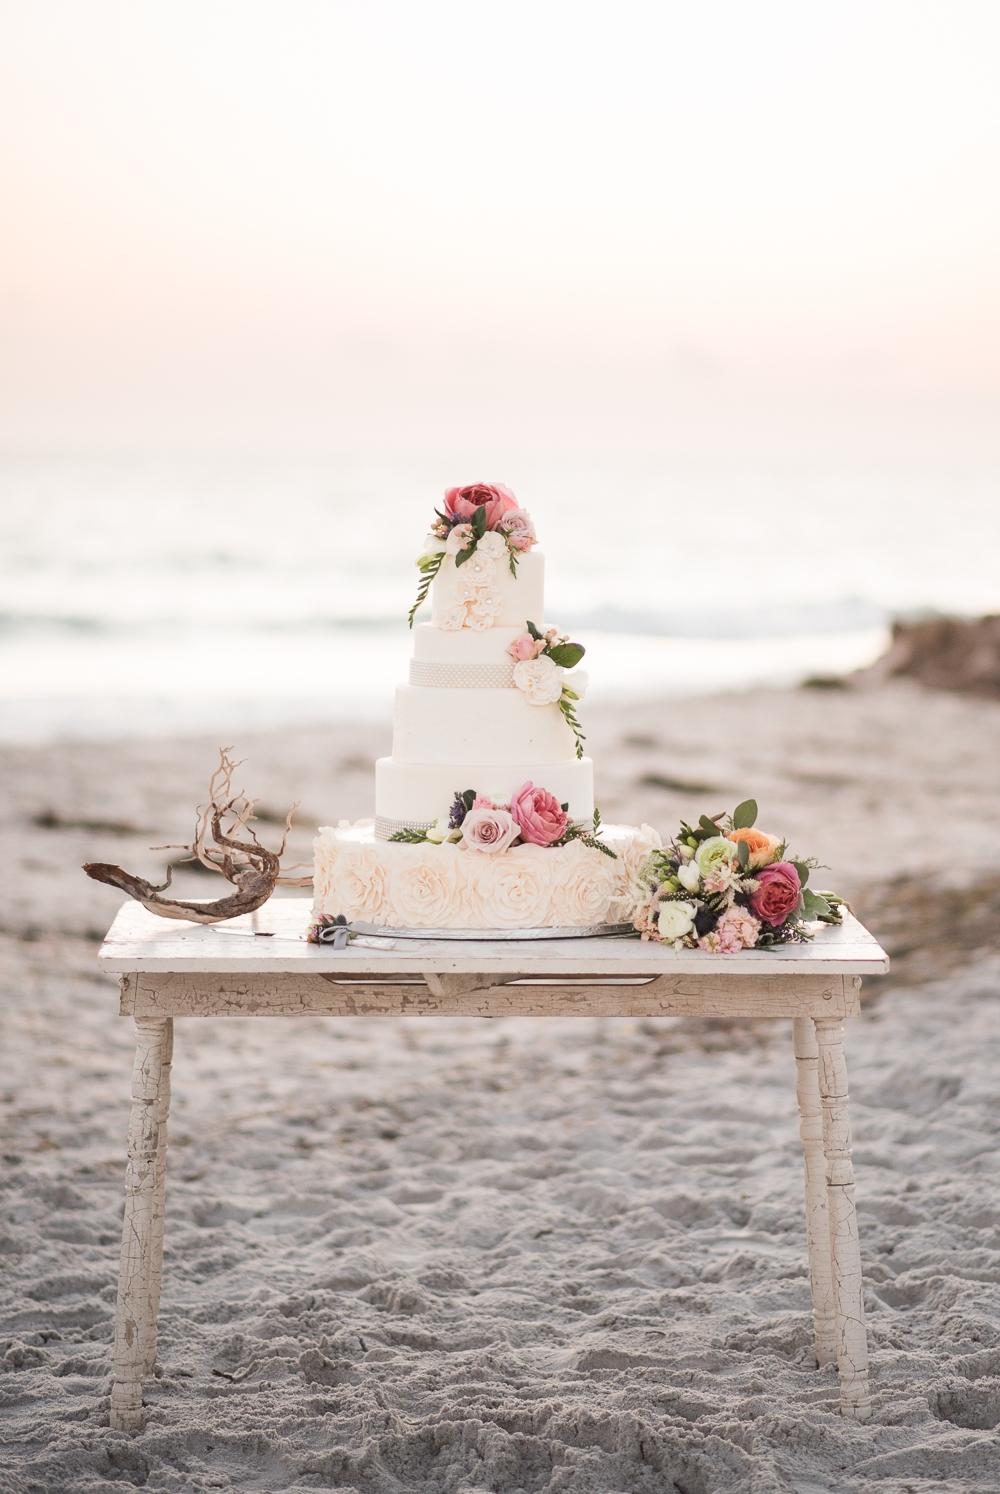 2016 HLM Wedding Beach Shoot 23.jpg